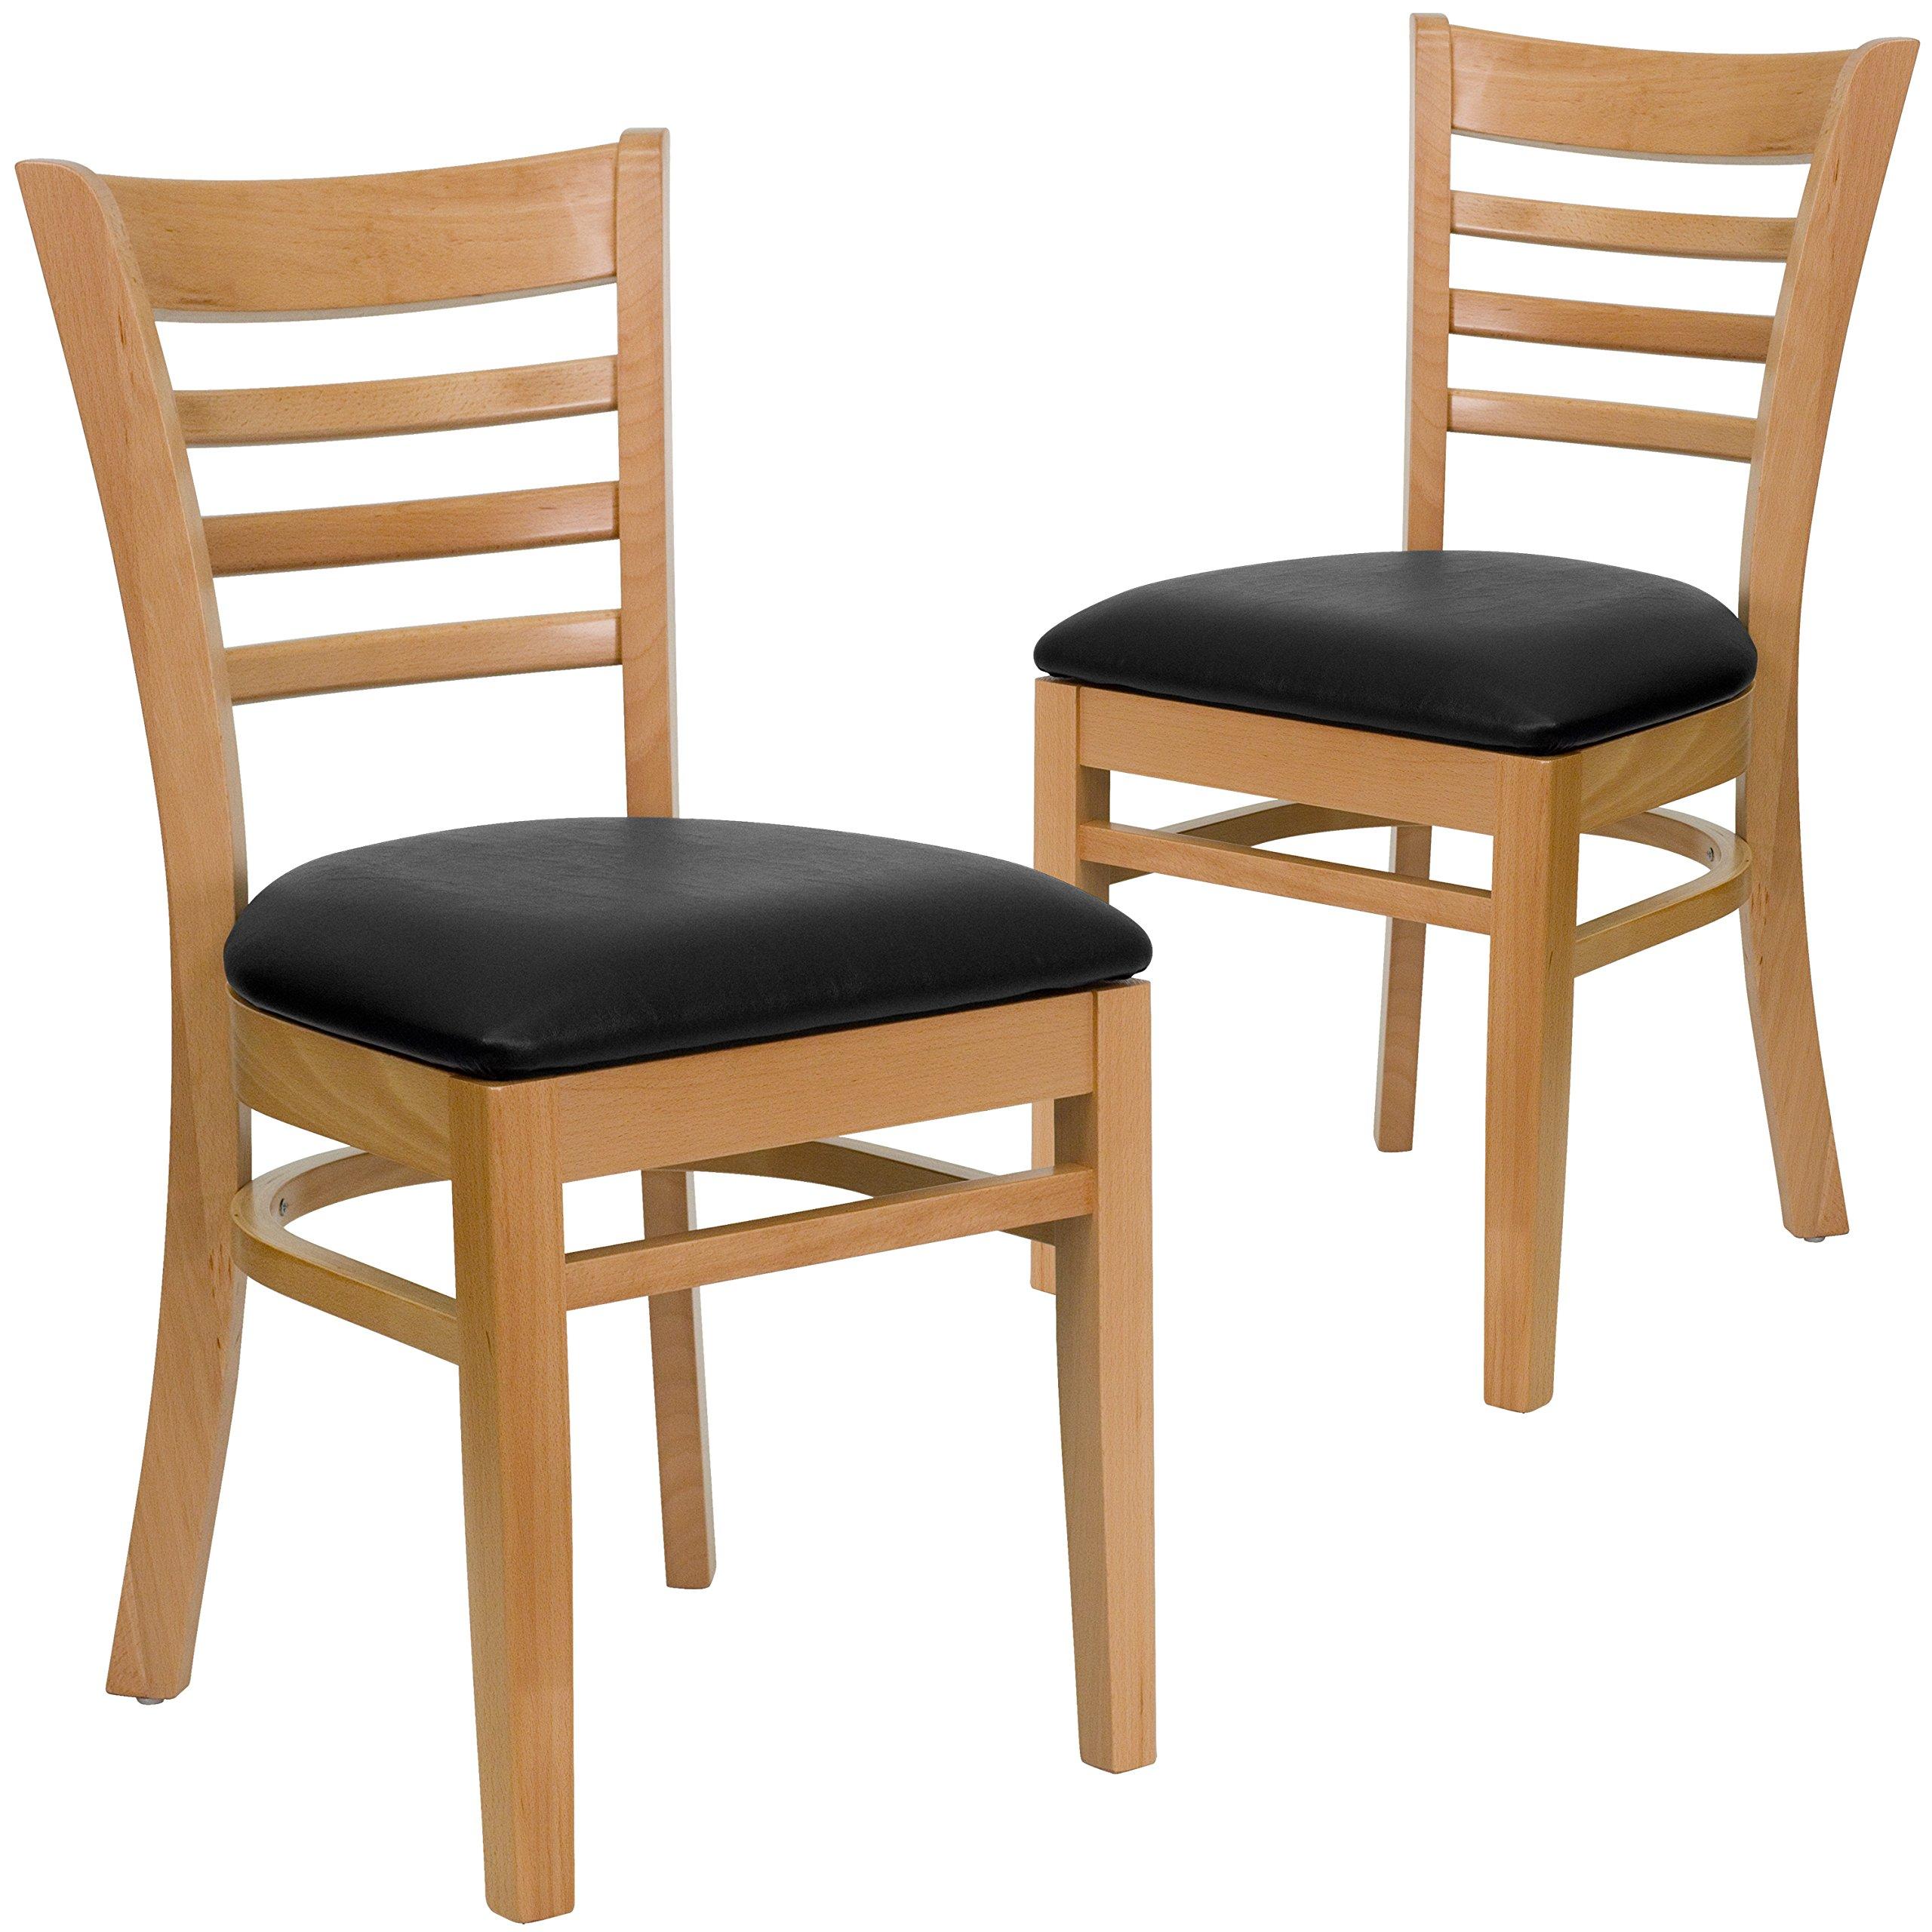 Flash Furniture 2 Pk. HERCULES Series Ladder Back Natural Wood Restaurant Chair - Black Vinyl Seat